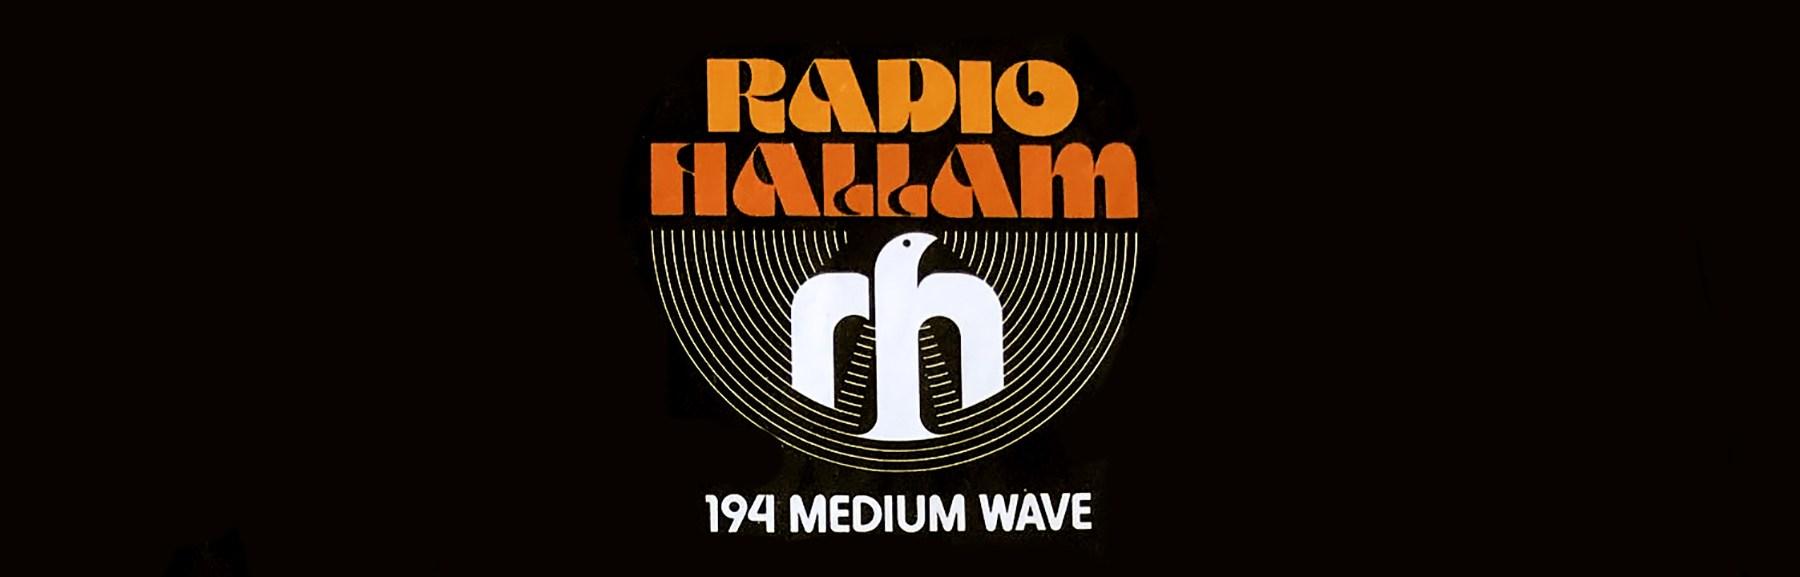 Radio Hallam